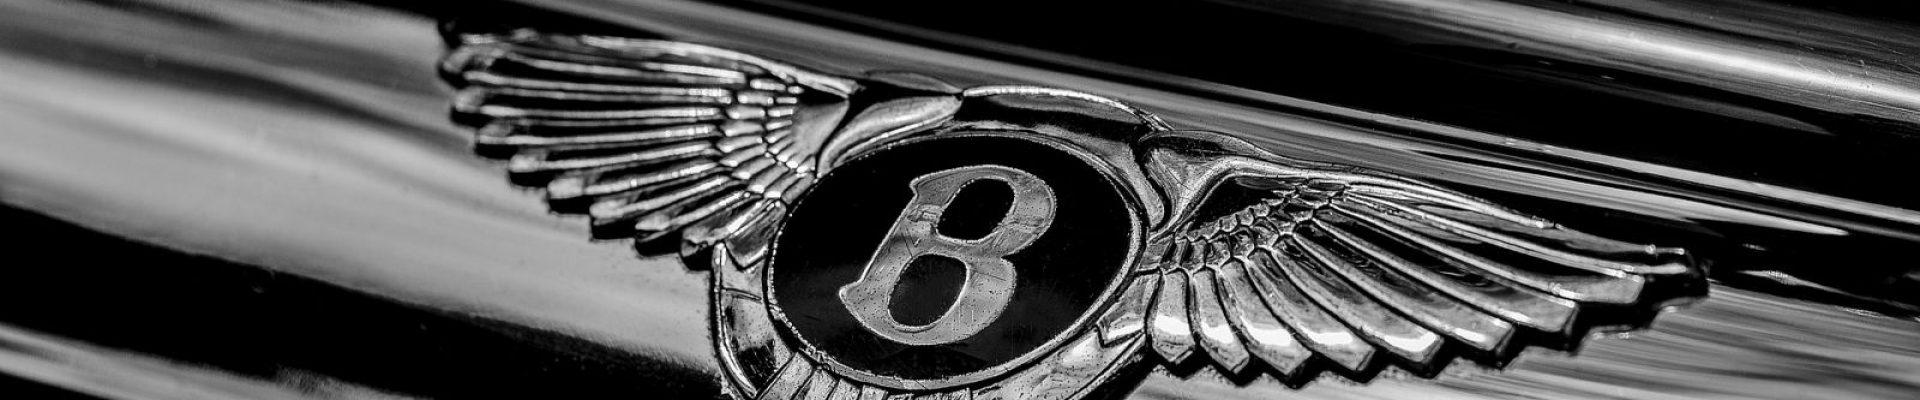 Bentley car battery banner 1